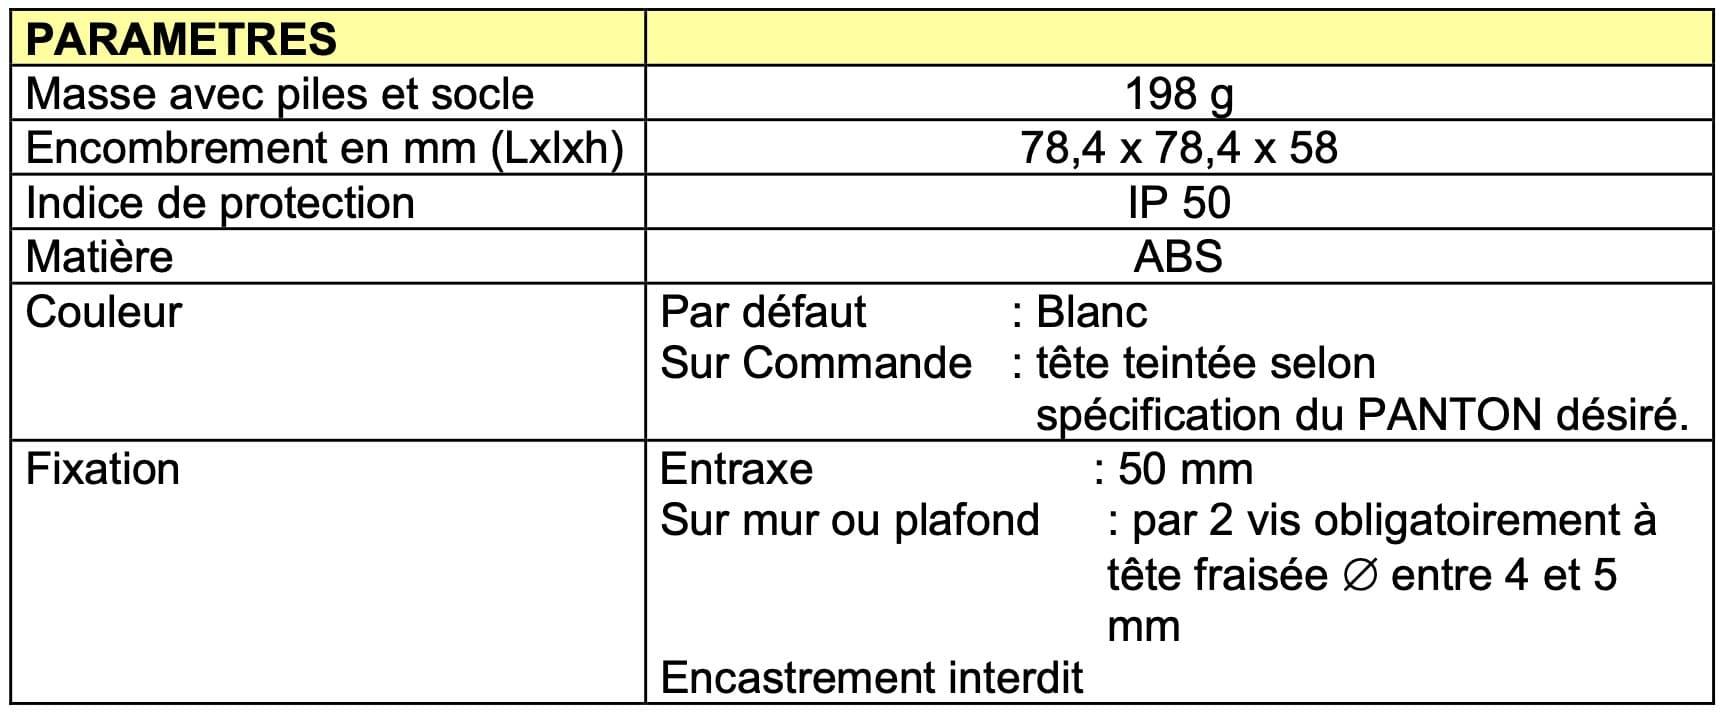 caracteristiques-mecaniques-indicateur-action-radio